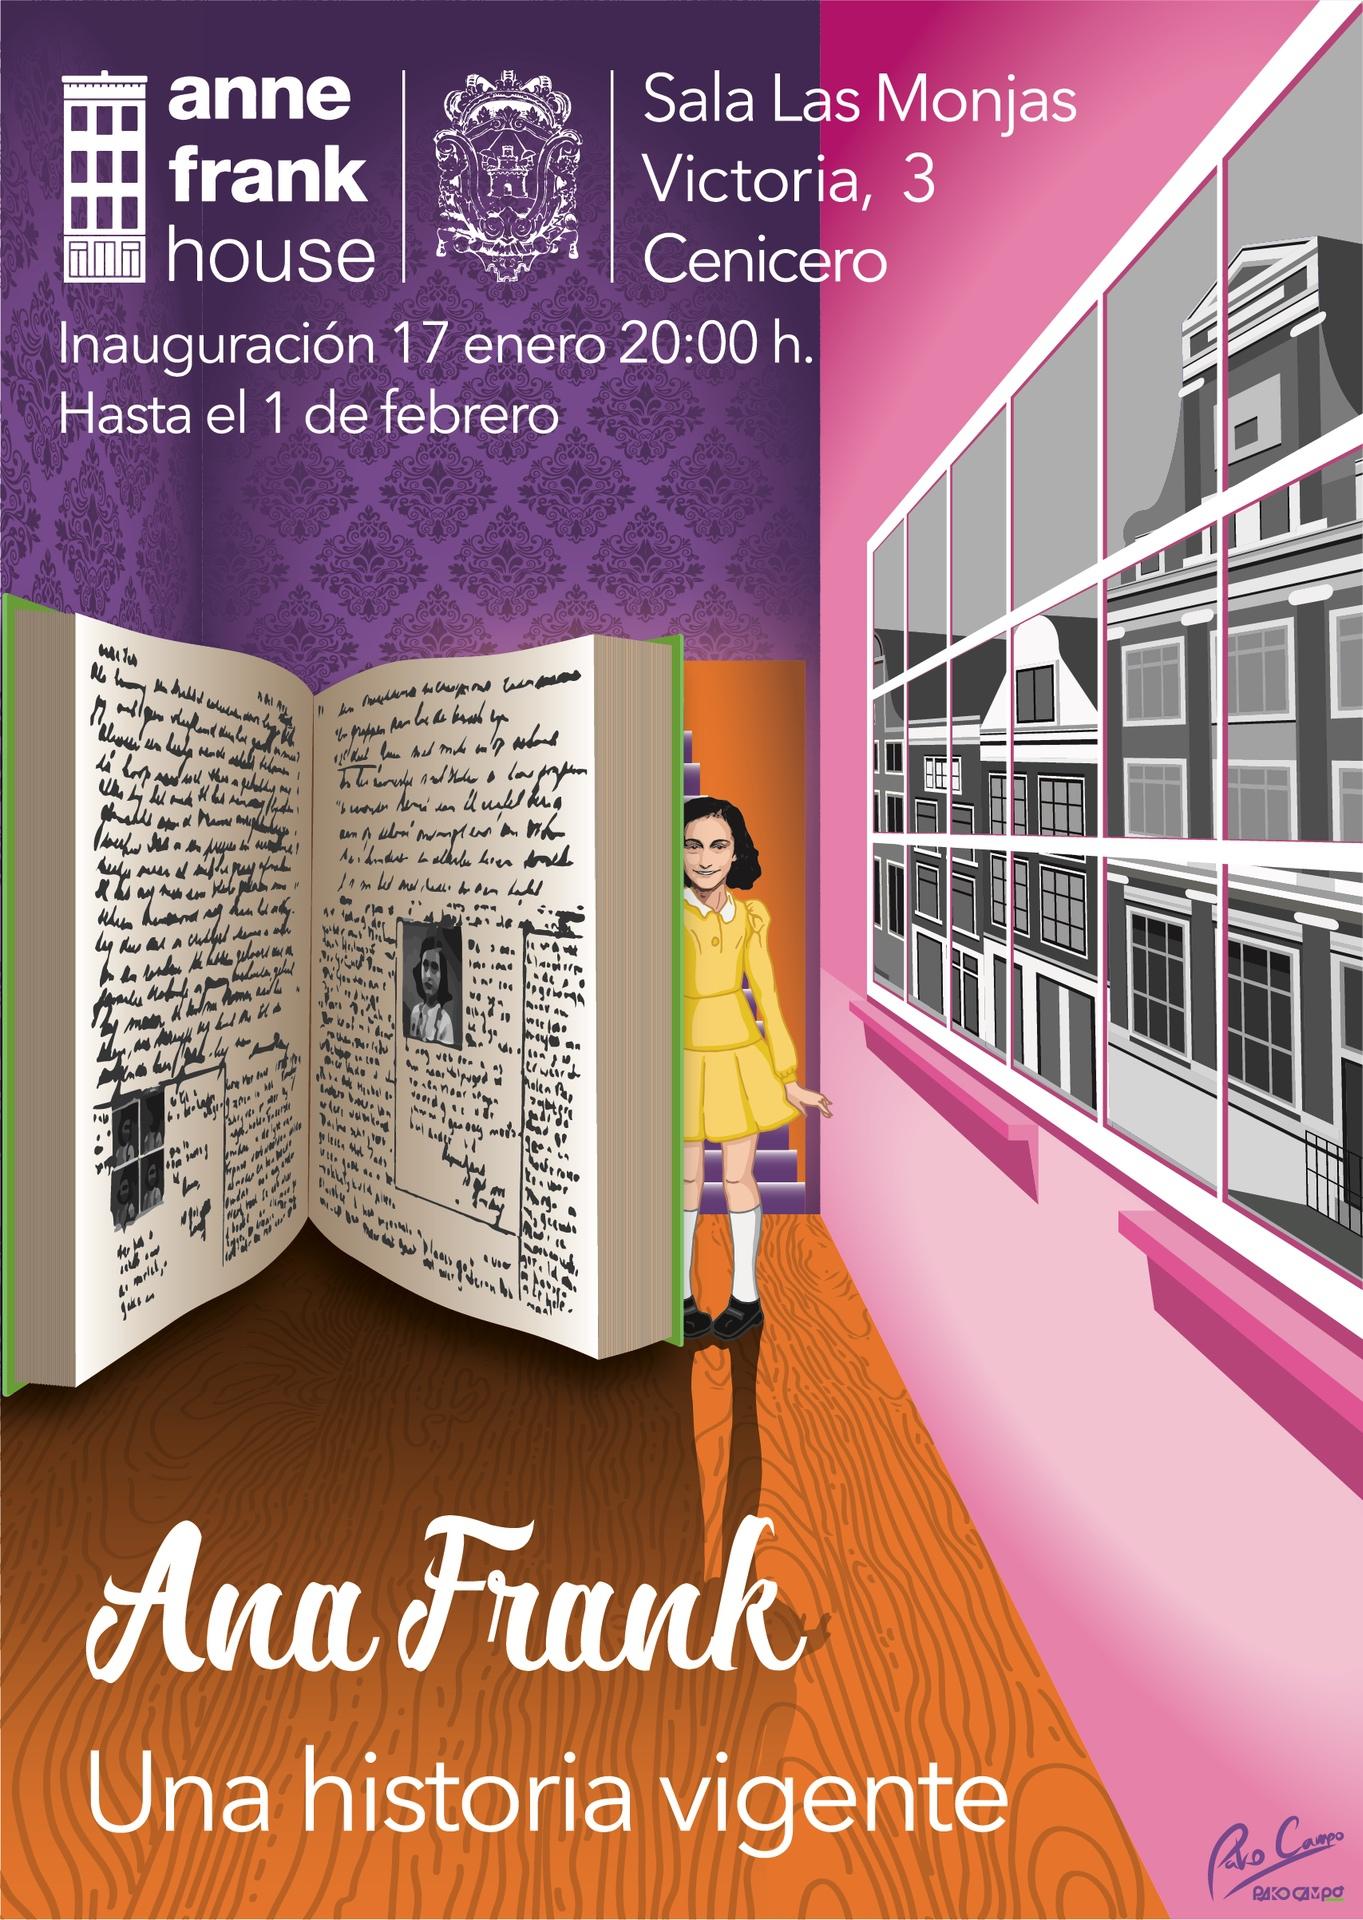 Ana Frank, una historia vigente by Pako Campo